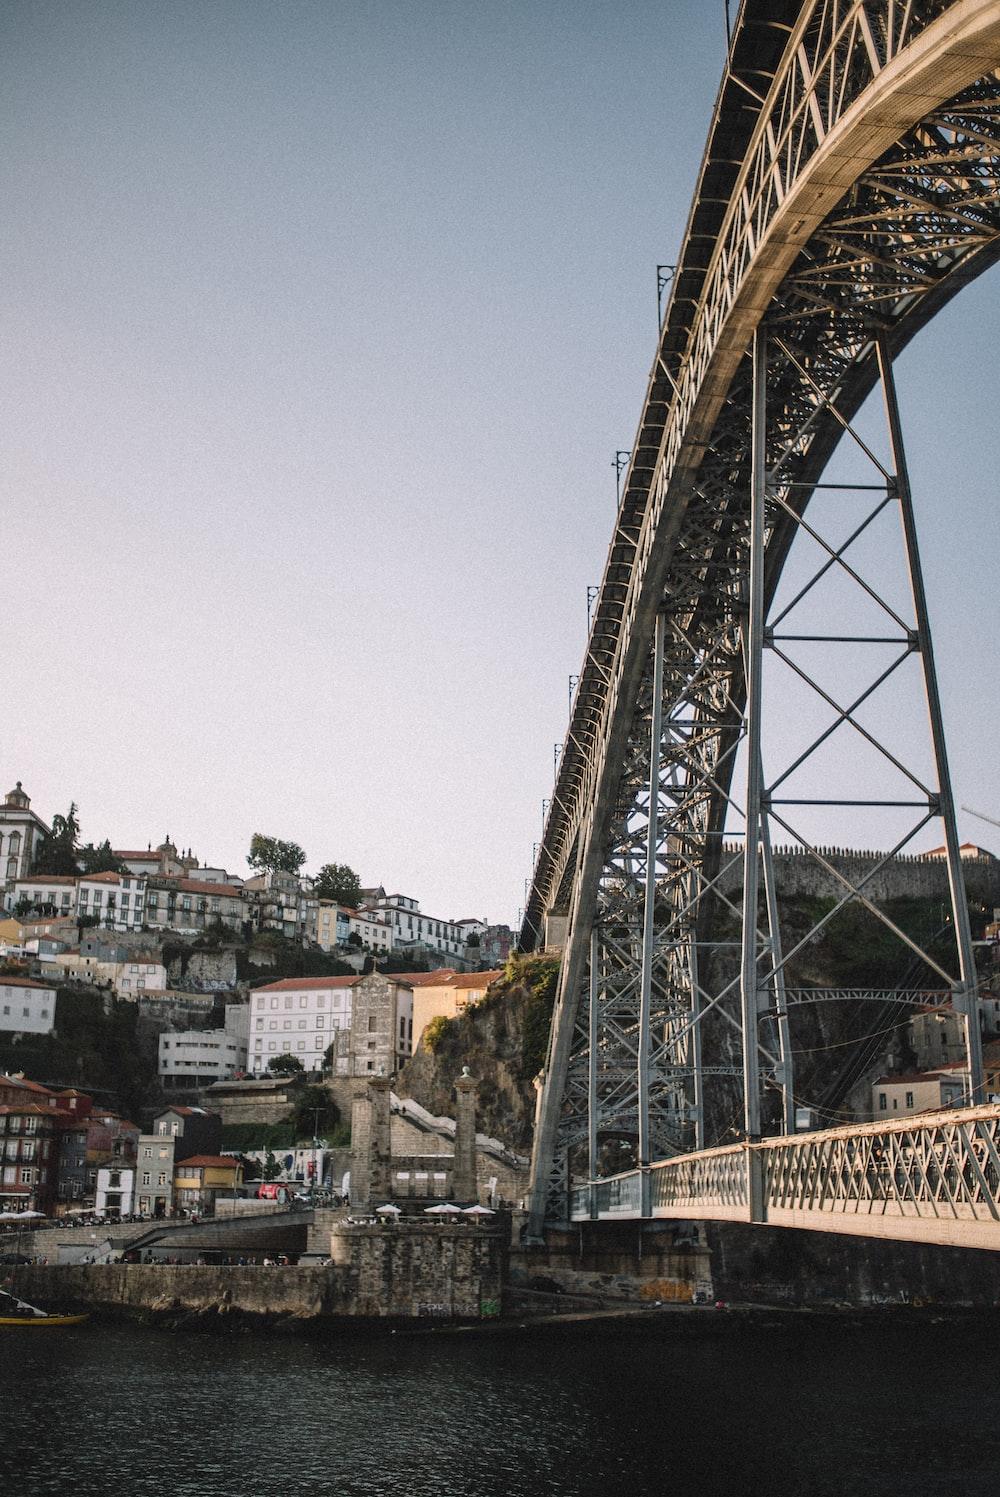 bridge near city during daytime